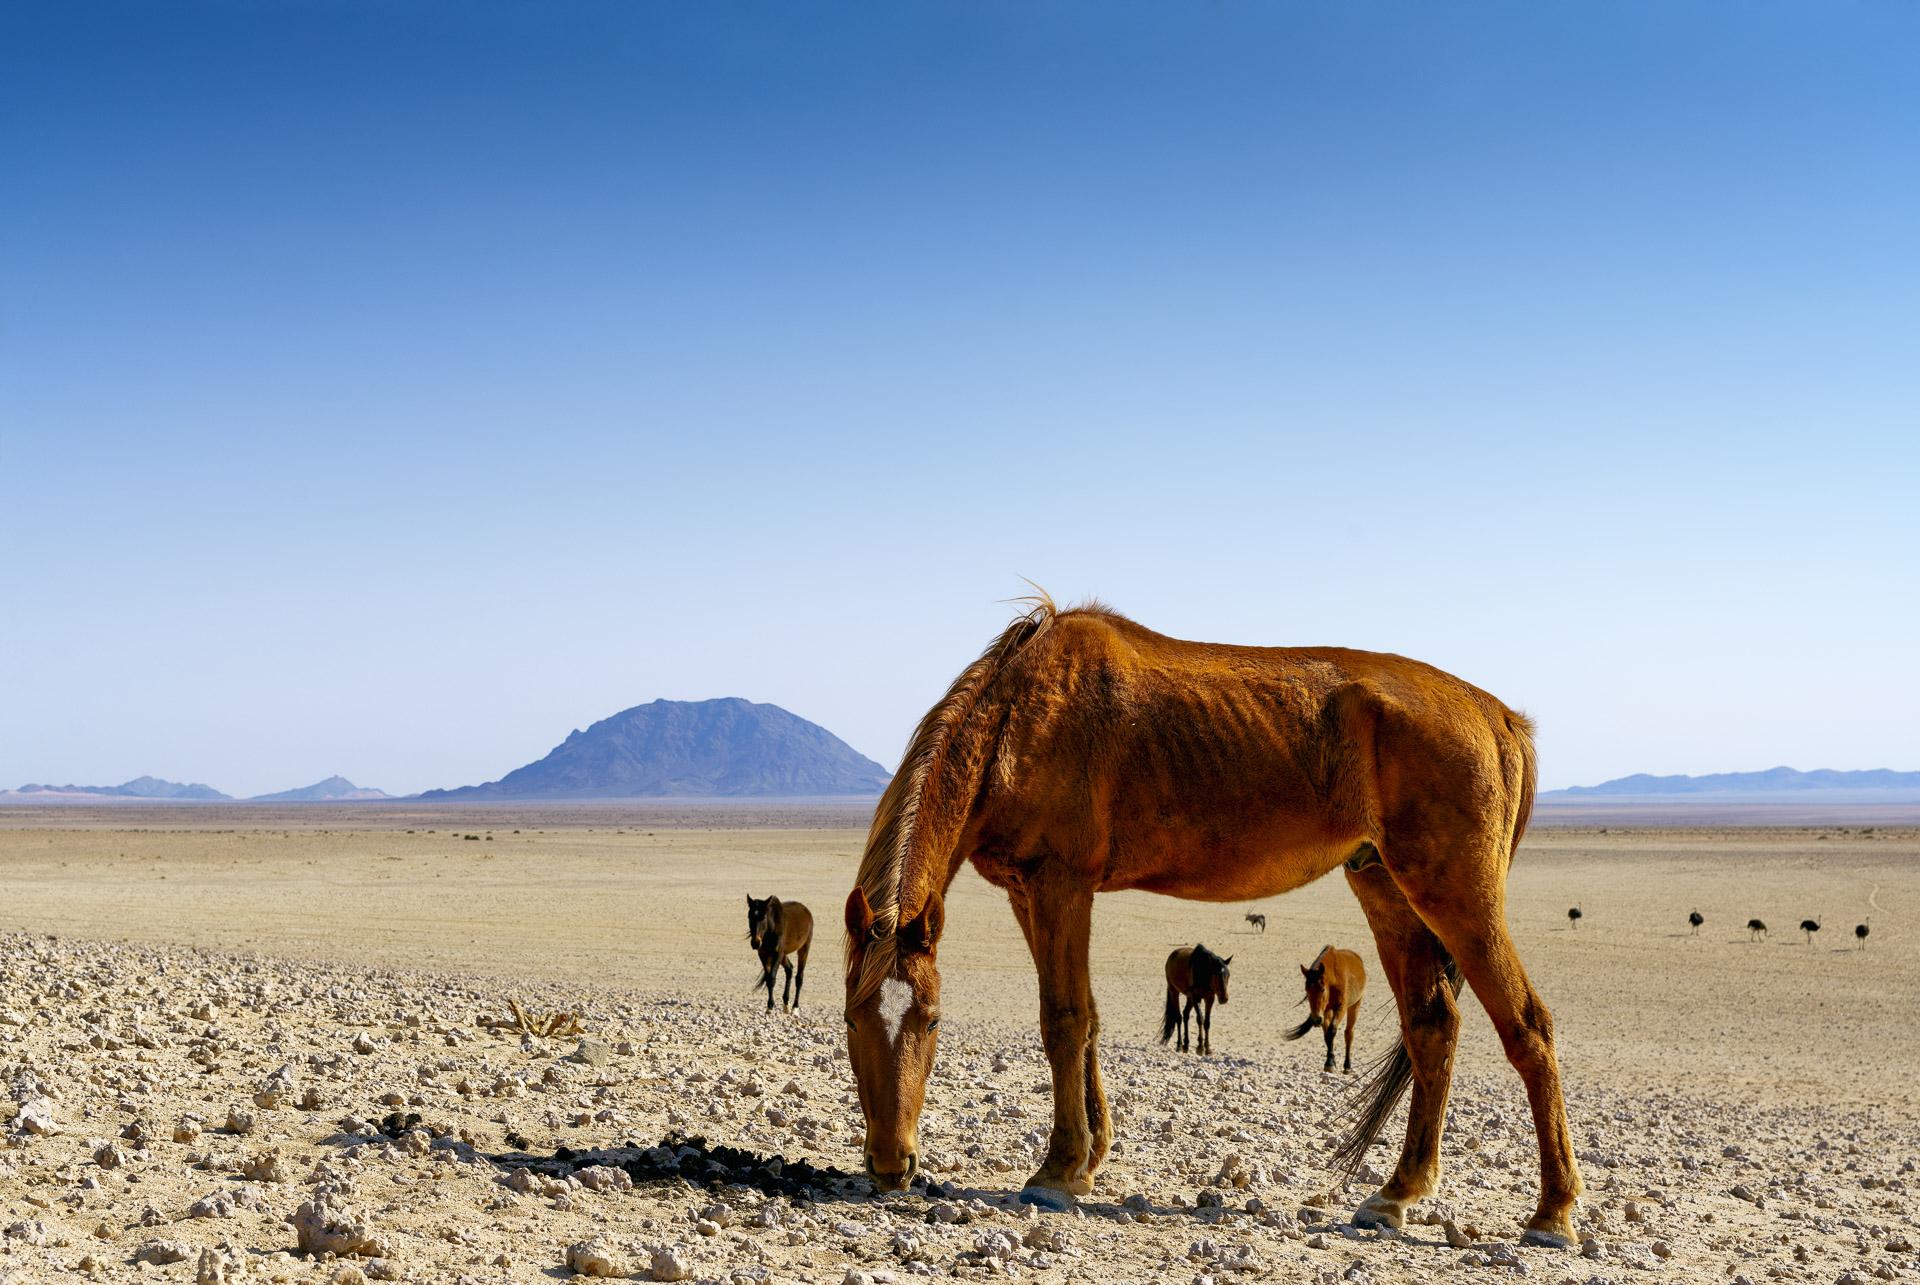 fotoreise-fotosafari-hd-2021-524-Namibia